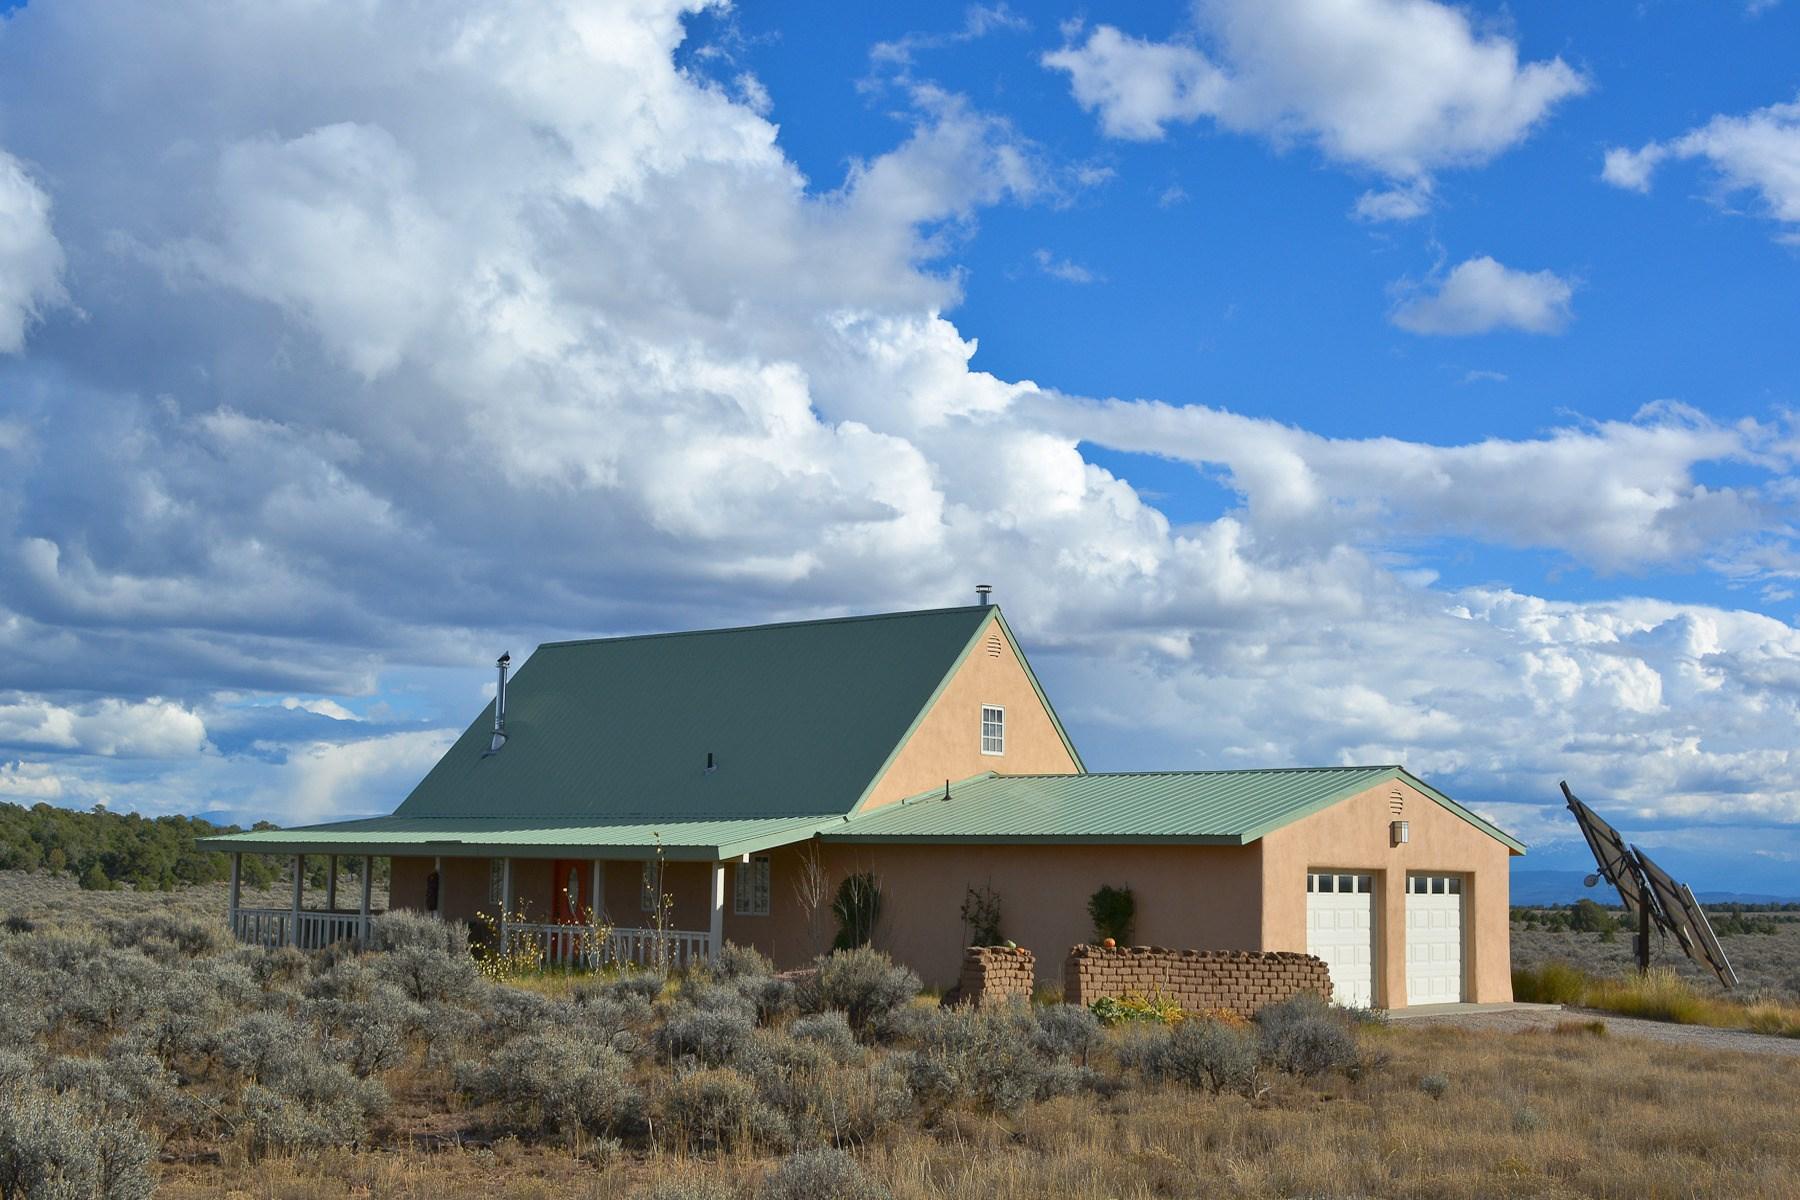 独户住宅 为 销售 在 Big Sage - Highway 285, Mile Marker 372 Big Sage - Hwy 285, Mm 372 彼得拉斯, 新墨西哥州, 87577 美国